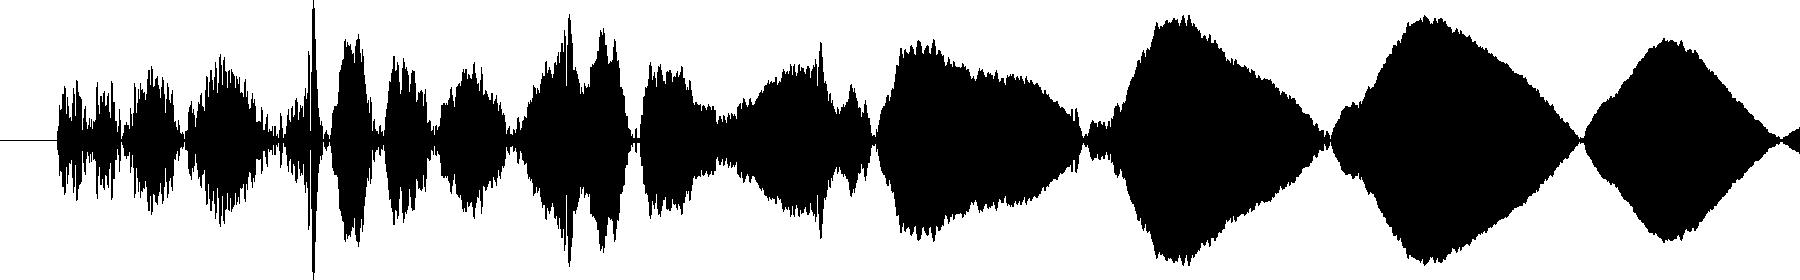 perc 1 3